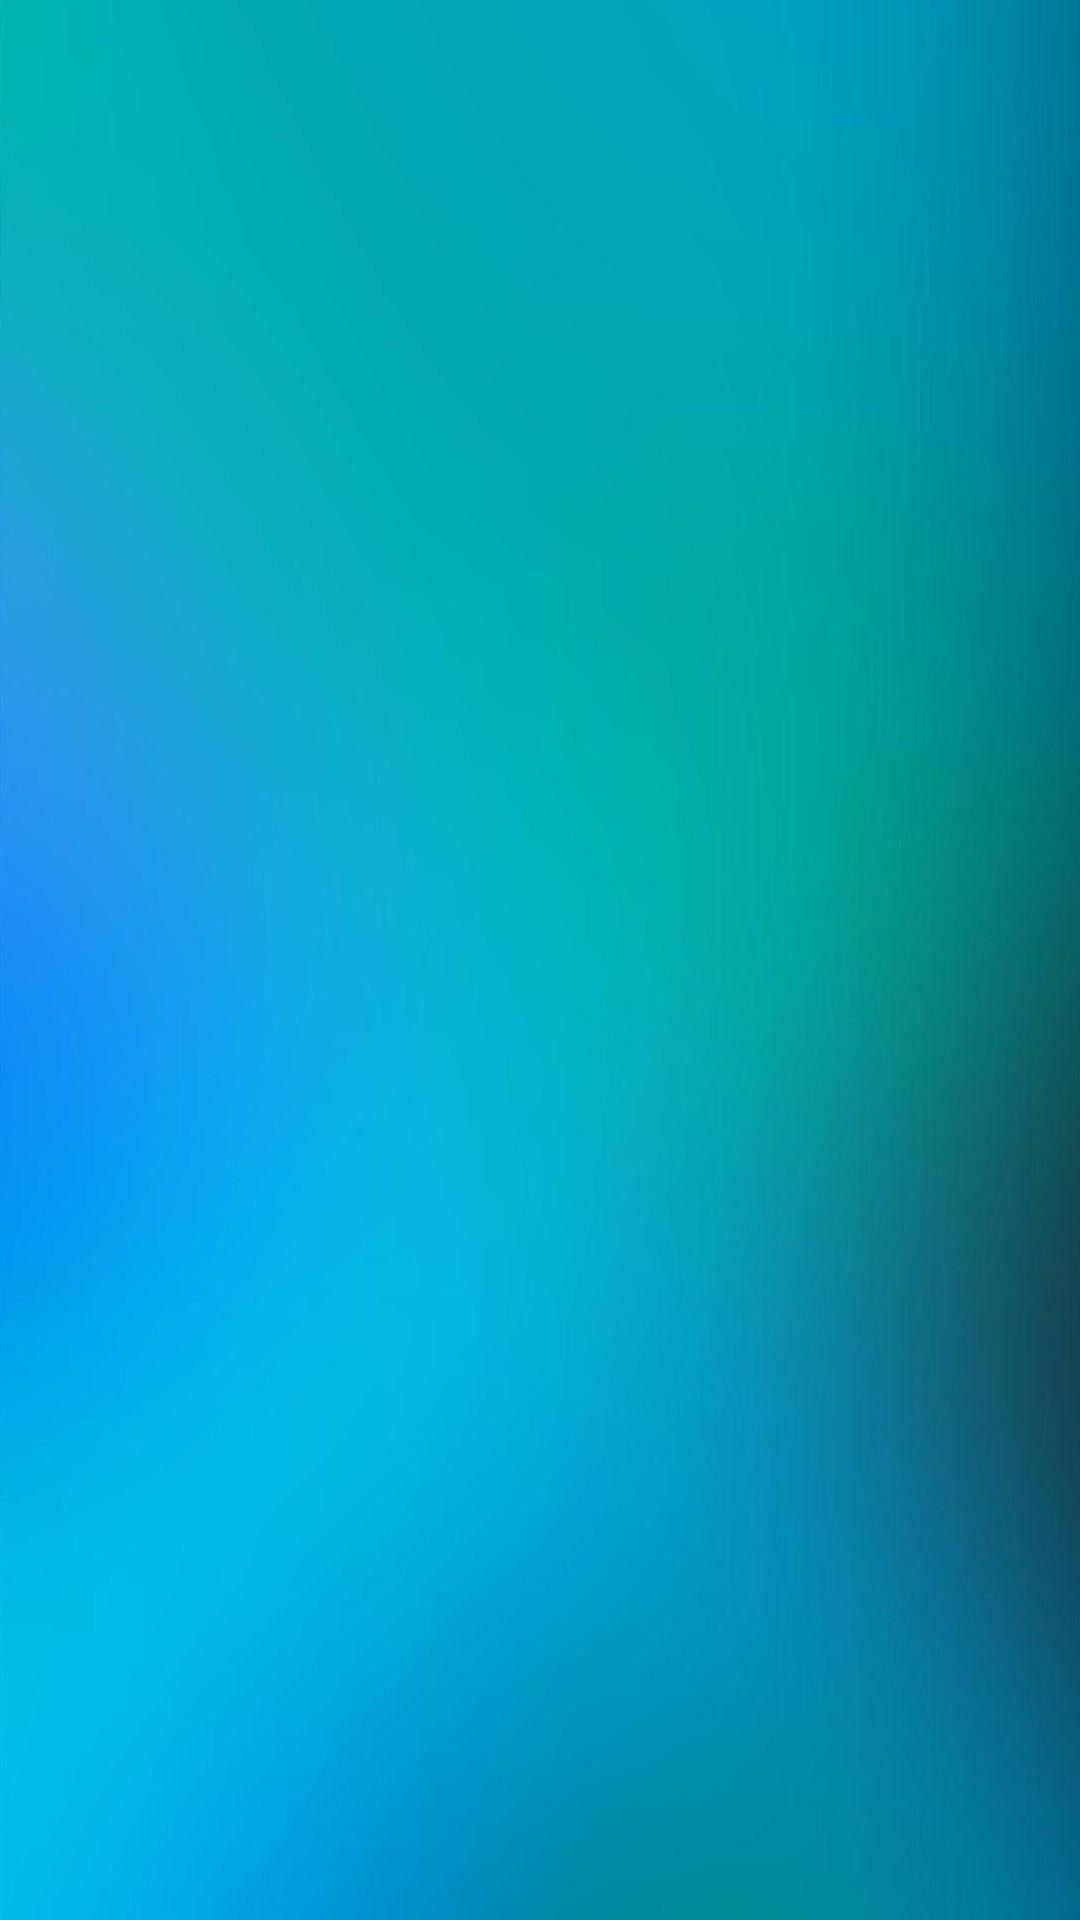 Gradient Blue Iphone Wallpaper